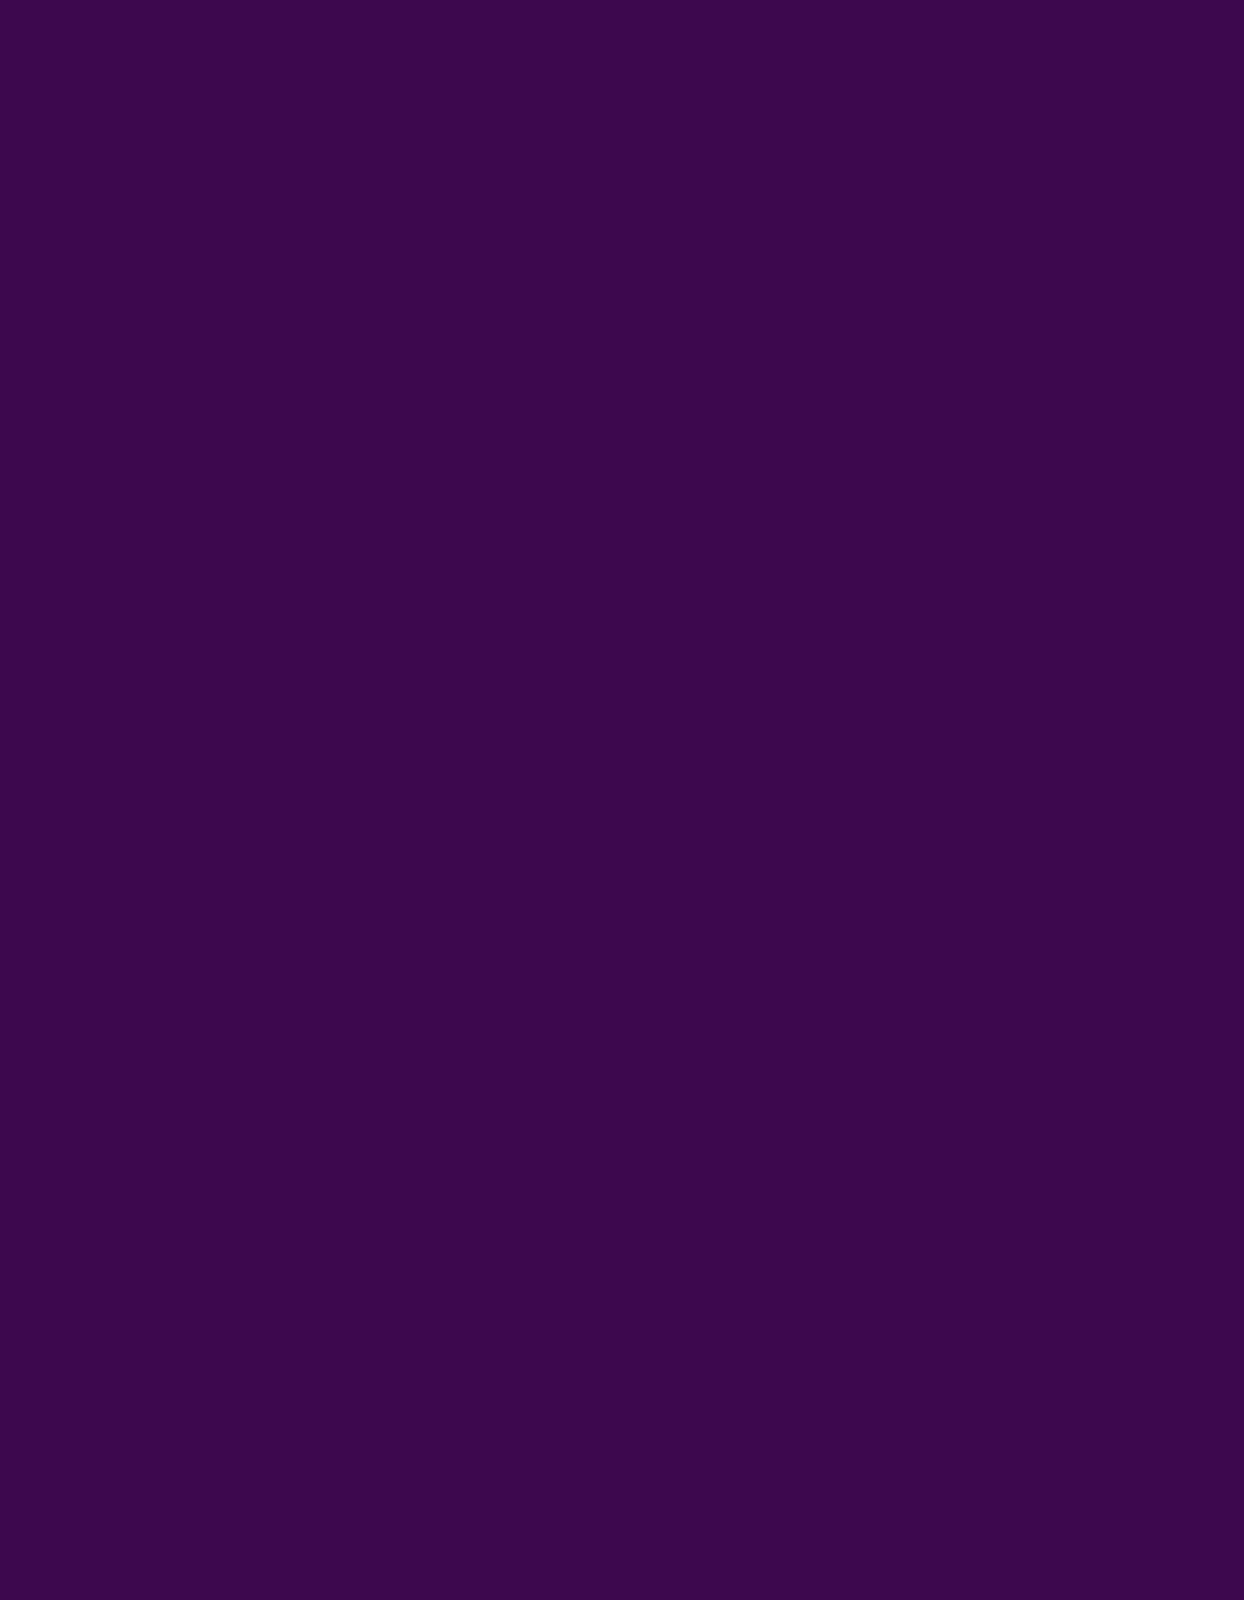 Dark Purple Backgrounds 1244x1600